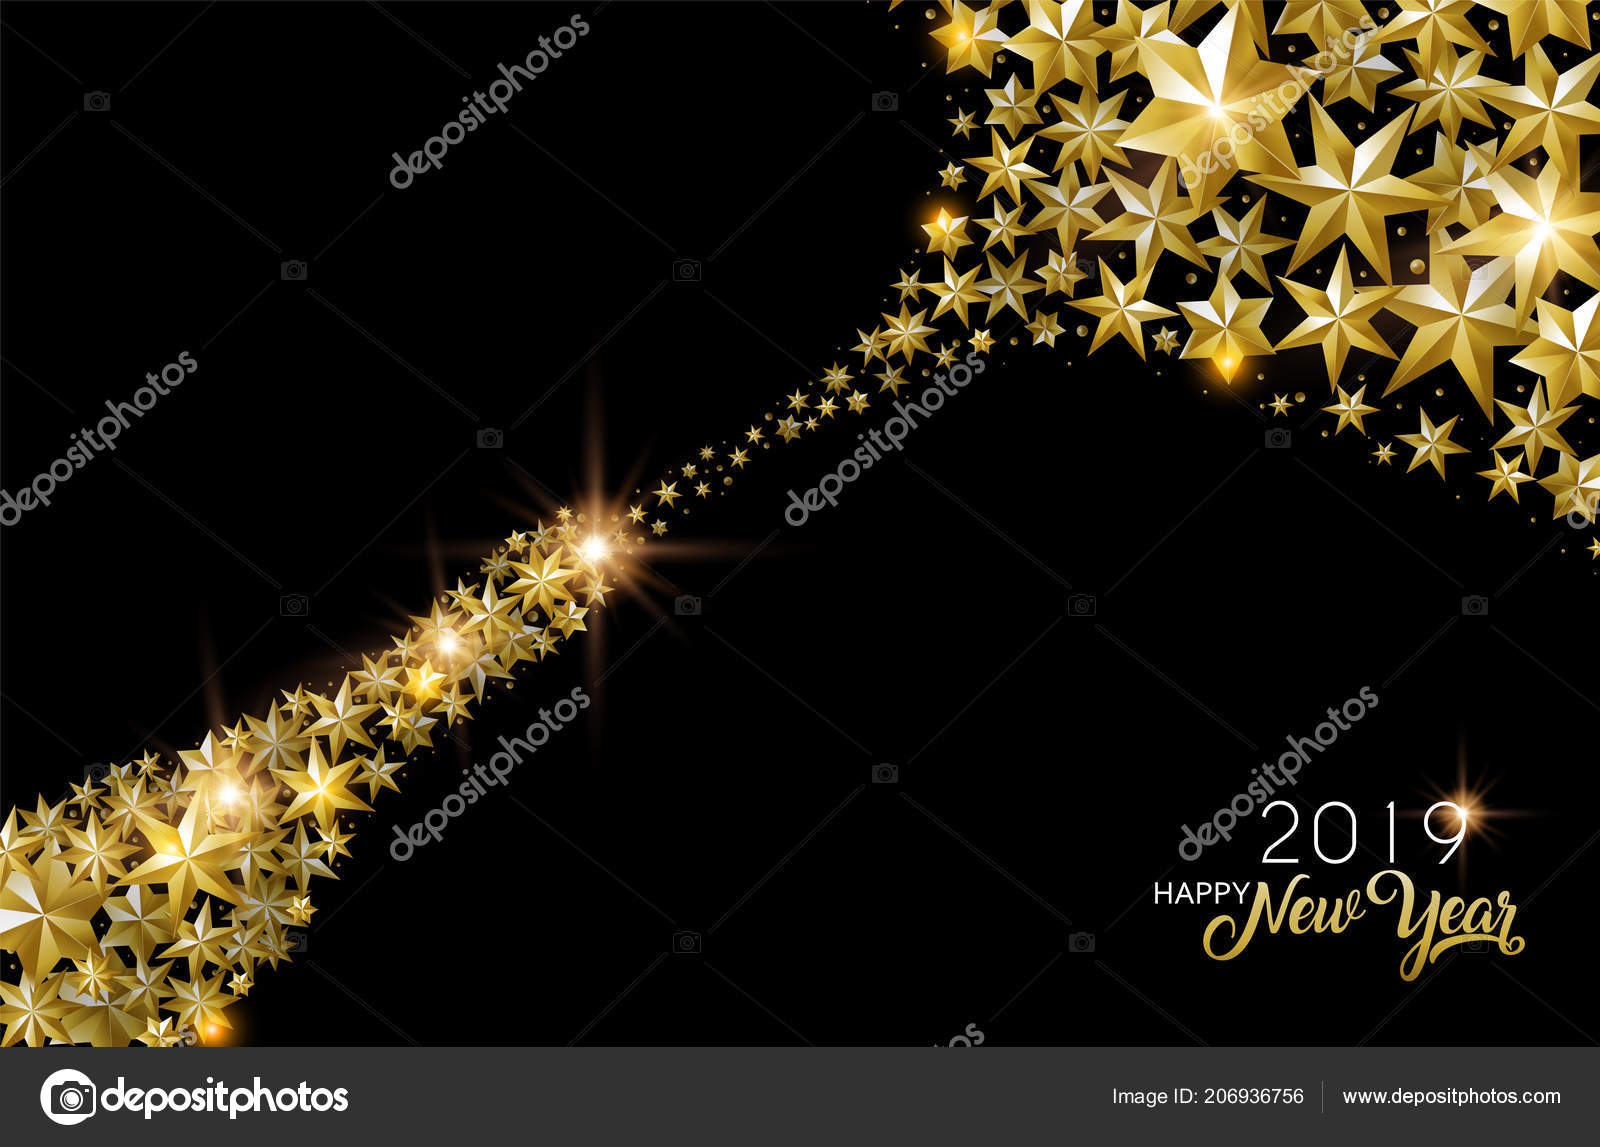 Happy New Year Elegant Images 14